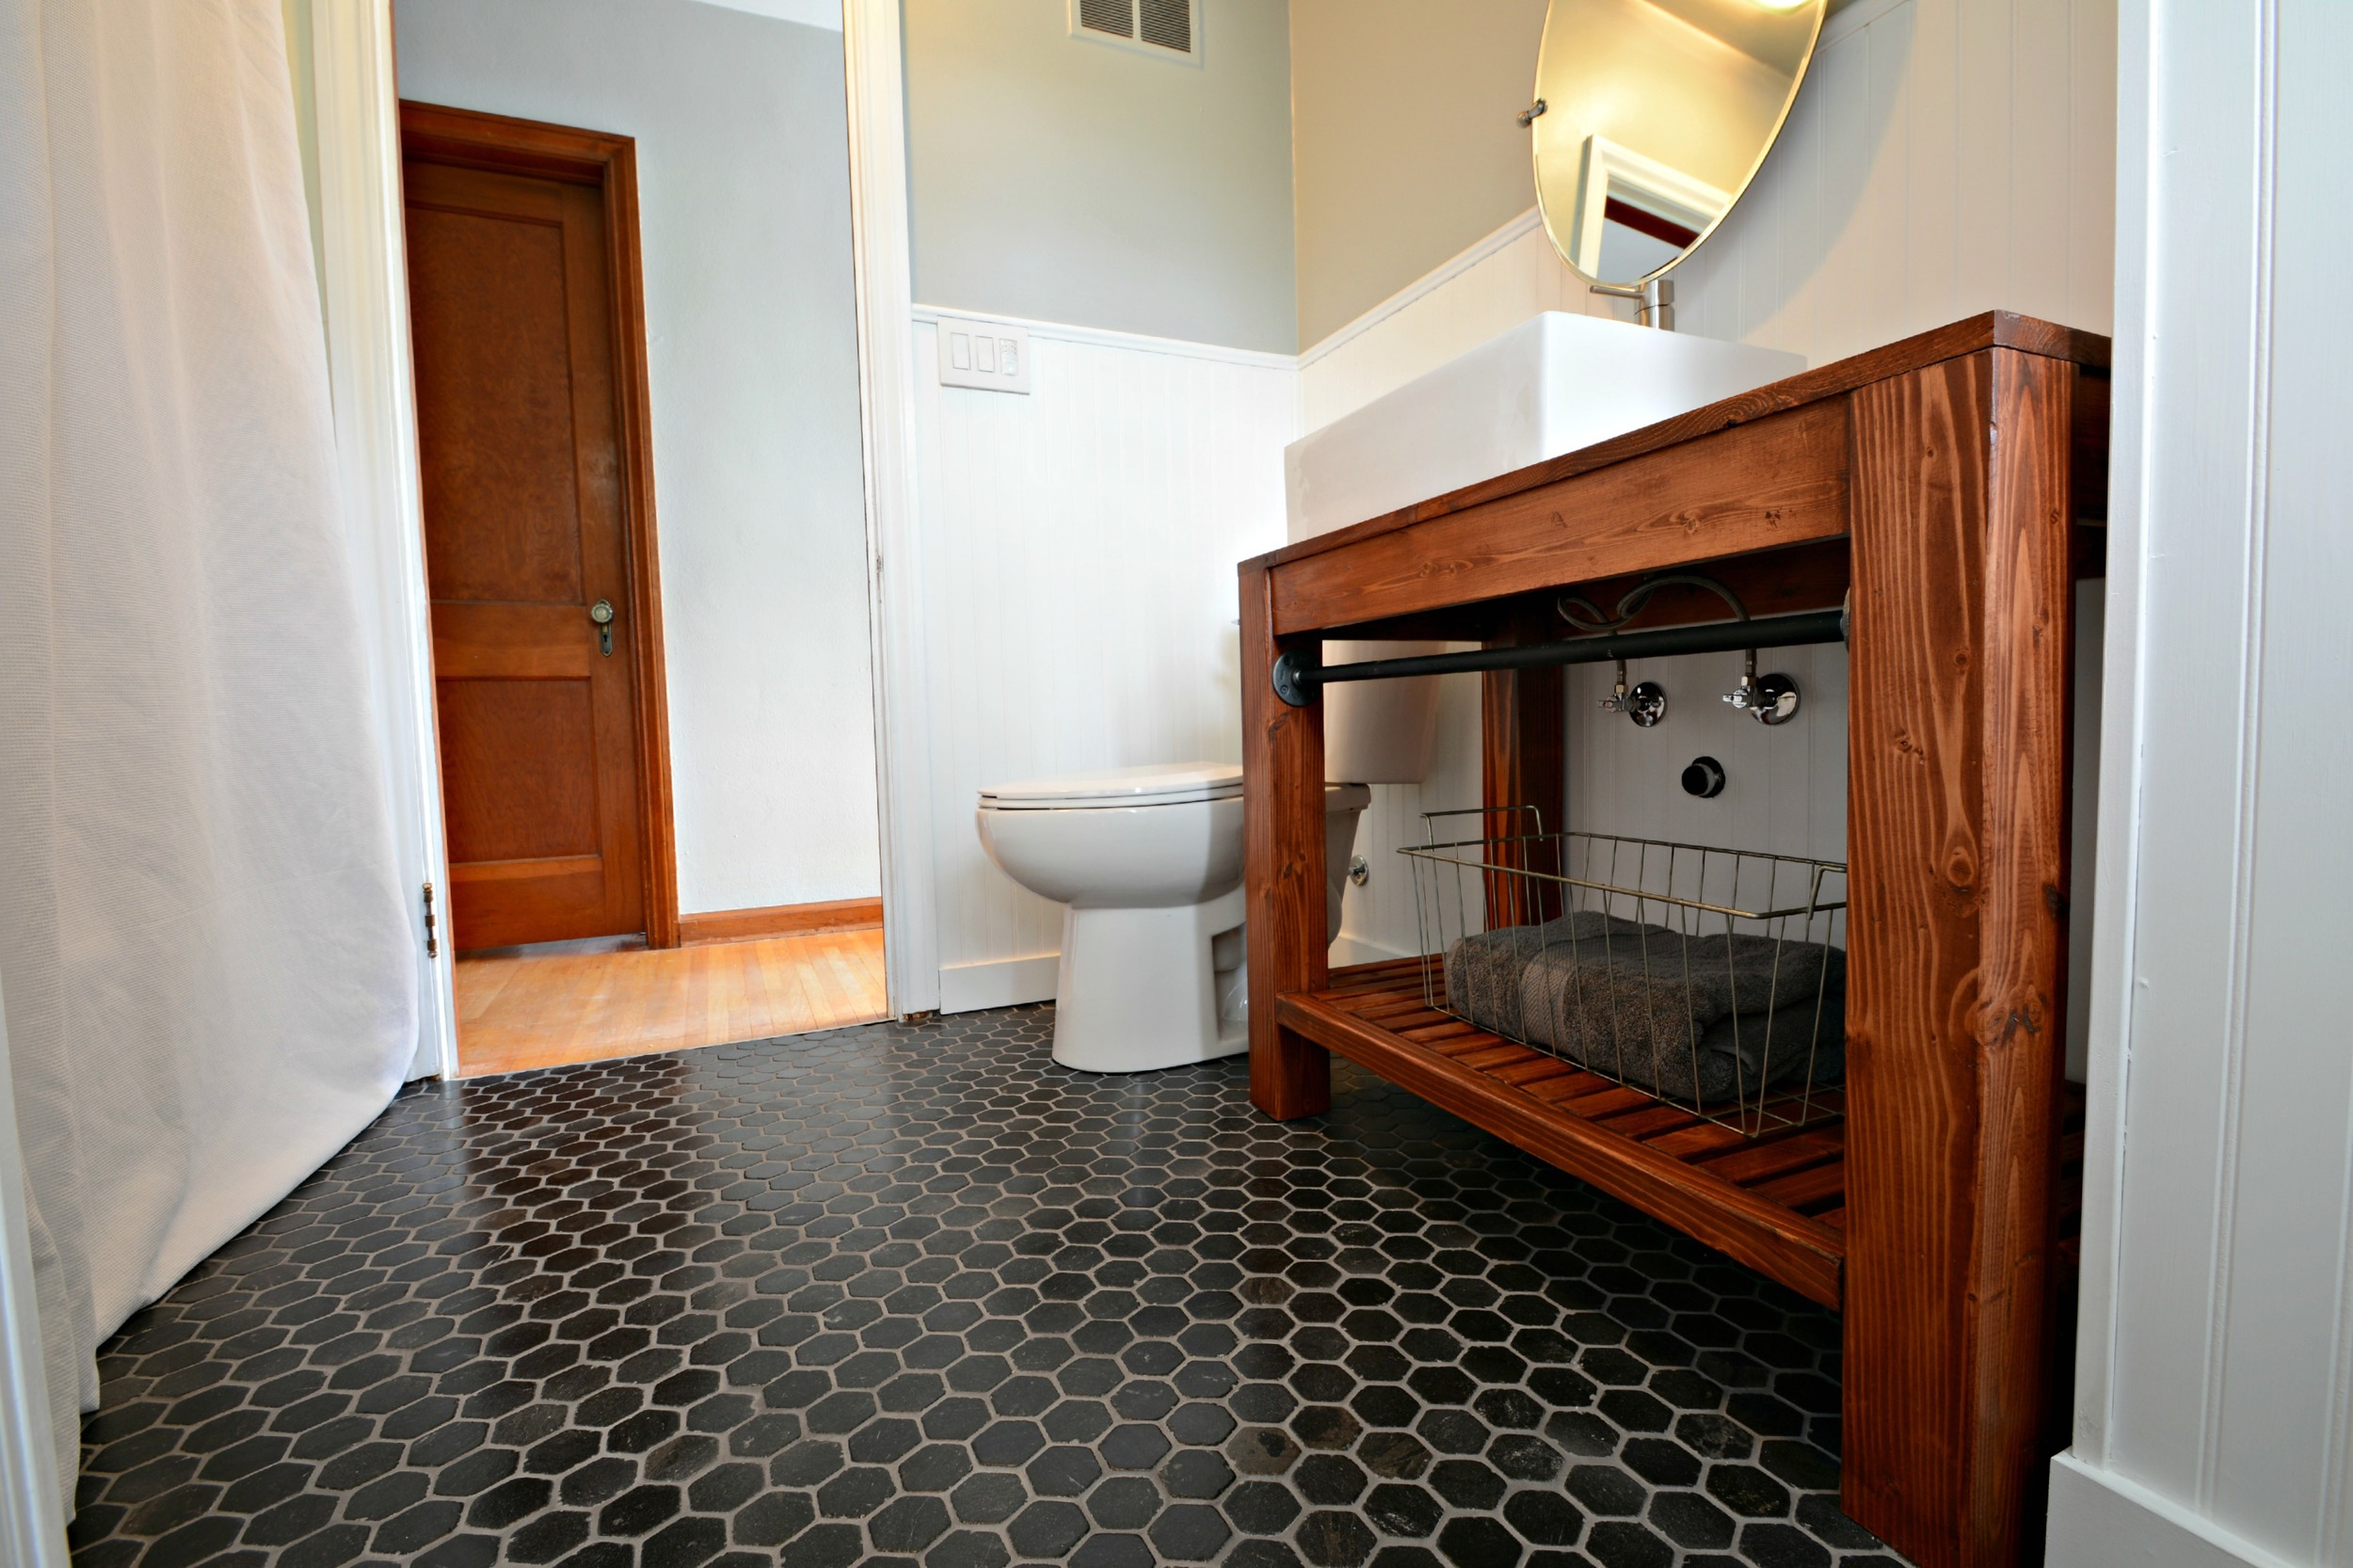 Modern Farmhouse Bathroom Vanity Tutorial